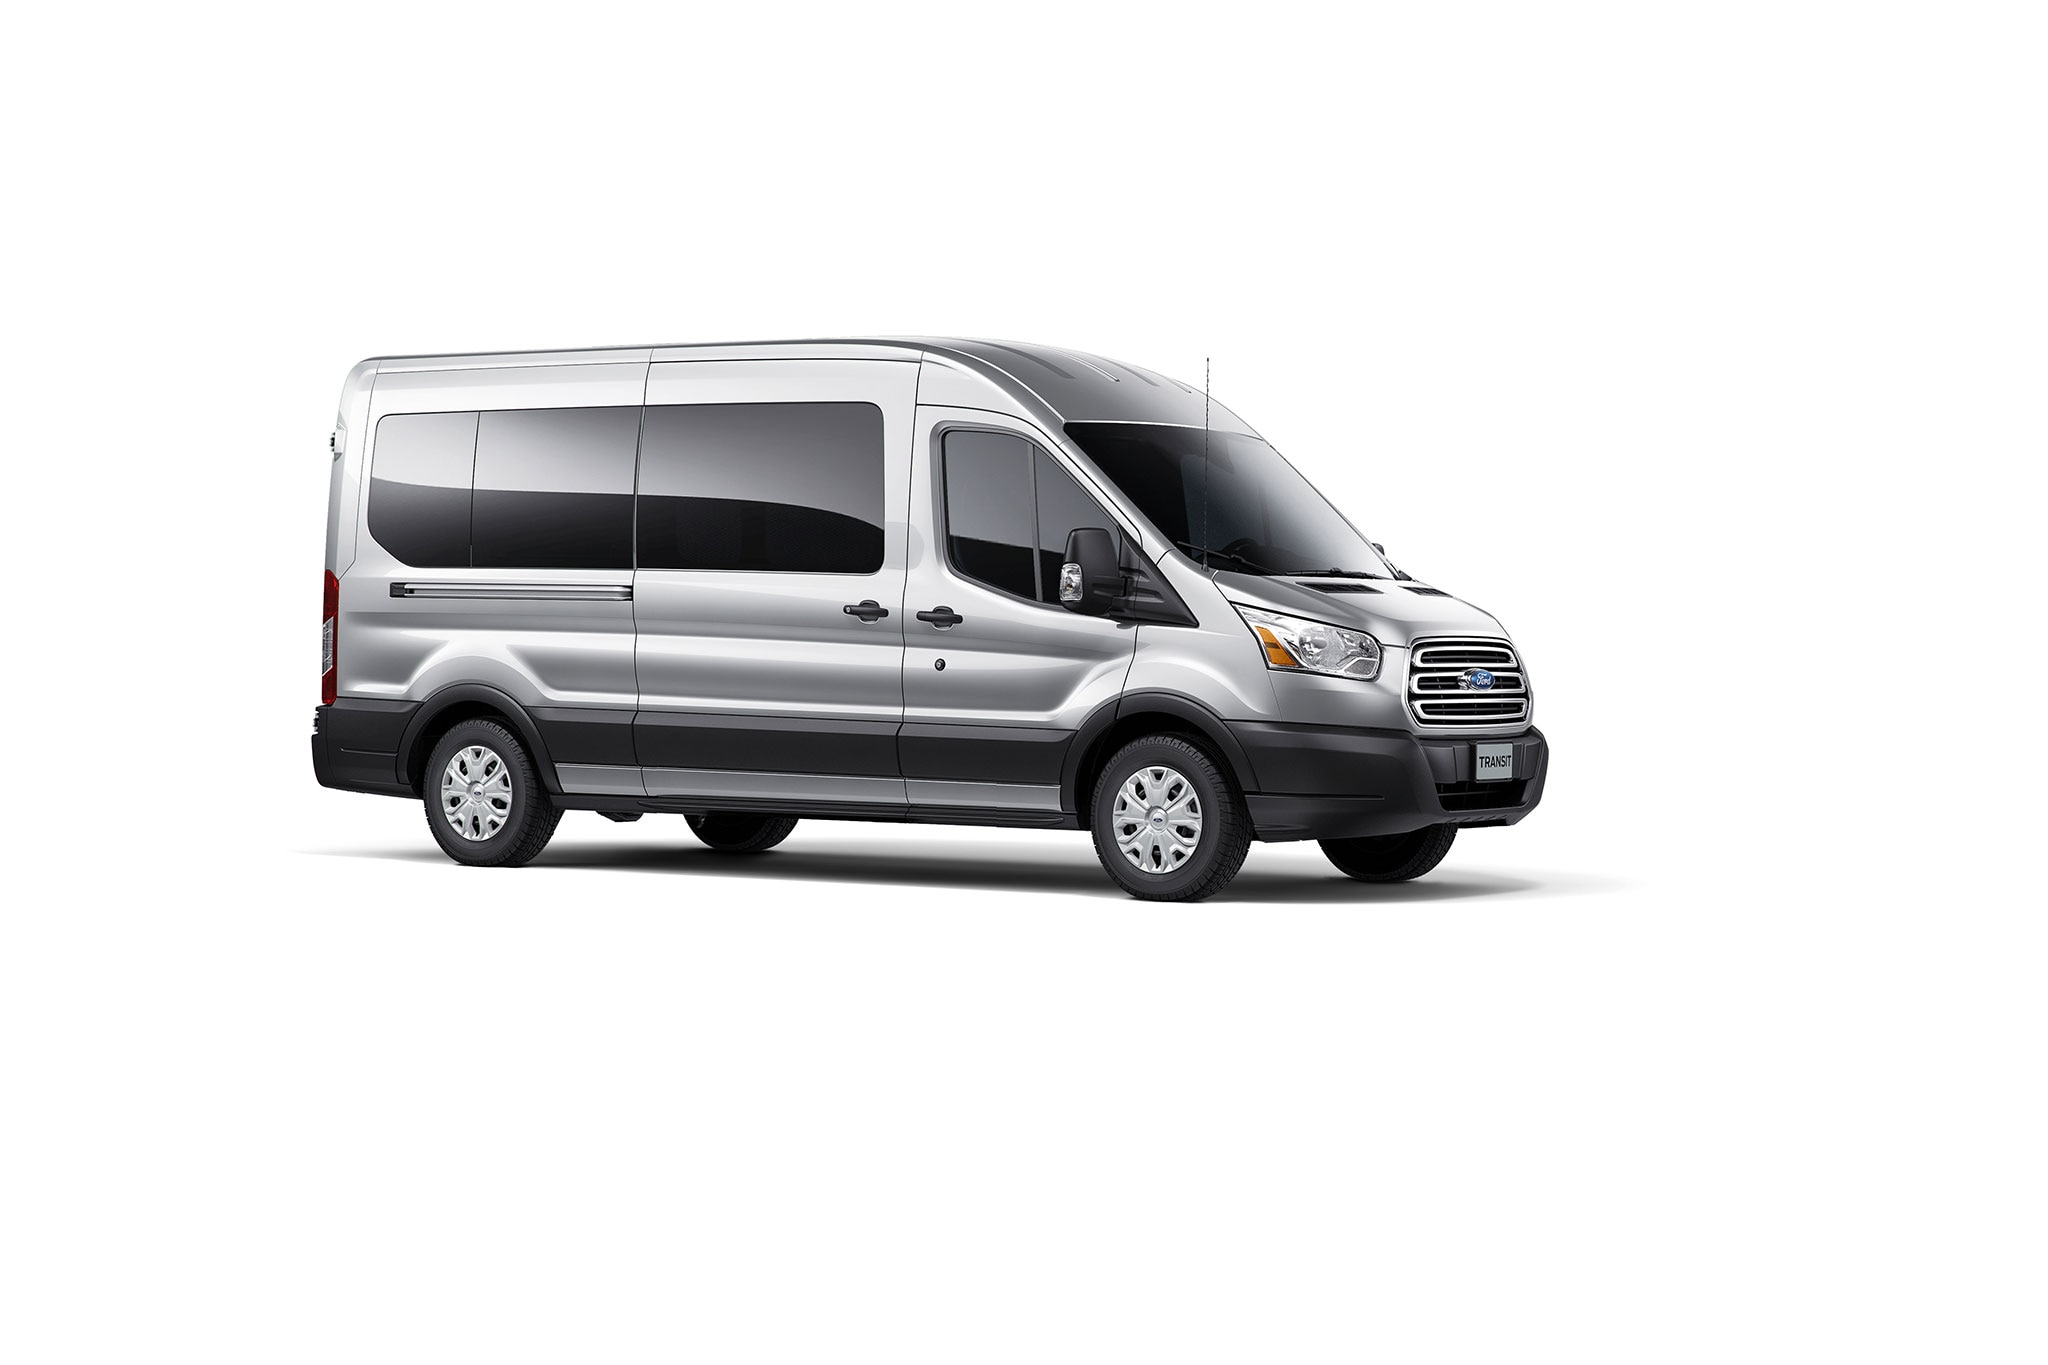 2015 Ford Transit Configurator Goes Live  Automobile Magazine